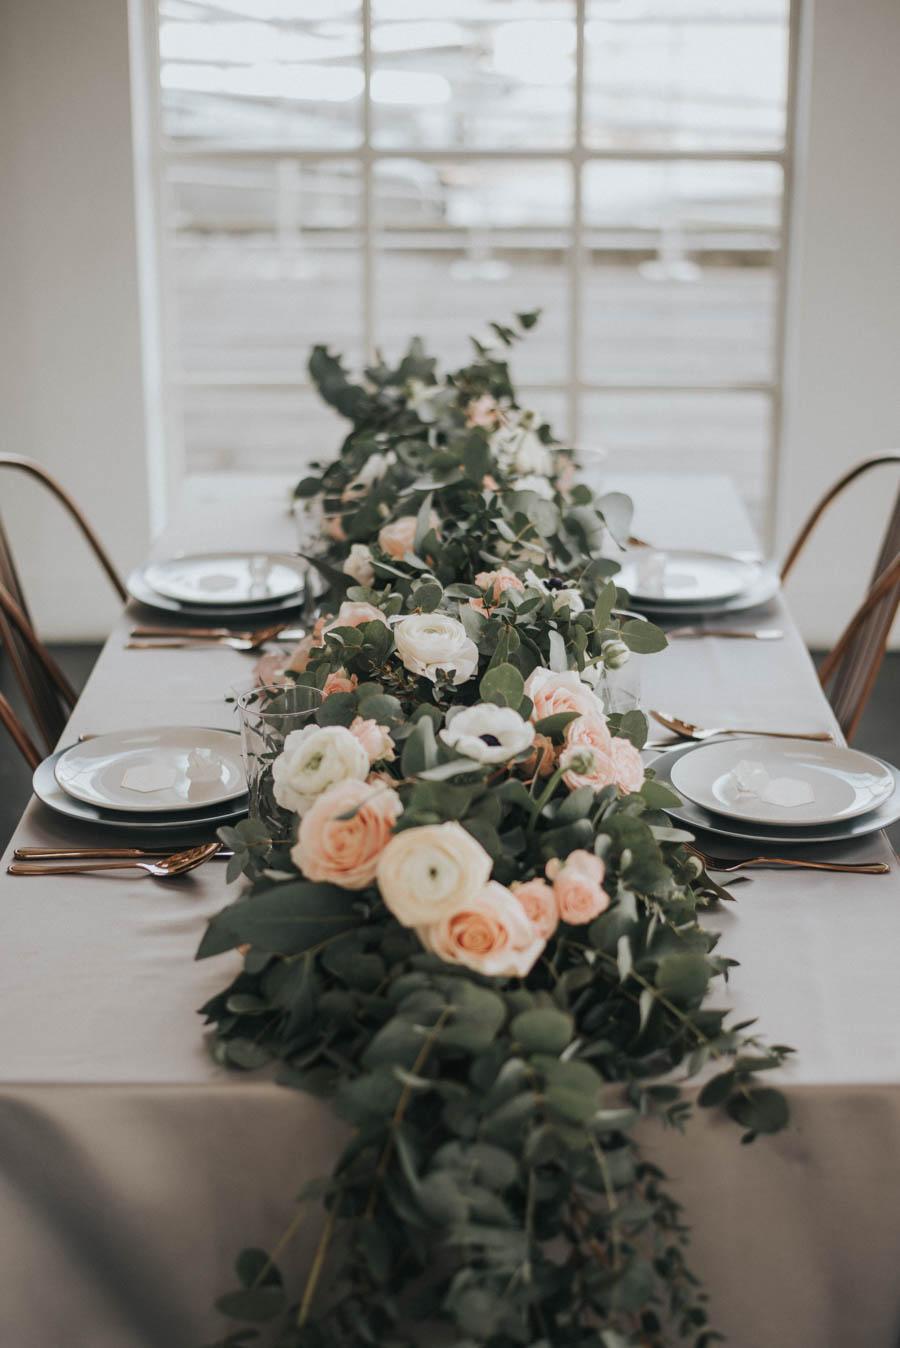 Industrial, Crystal Chic Styled Bridal Shoot: Cool Copper & Romantic Rose Quartz!Industrial, Crystal Chic Styled Bridal Shoot: Cool Copper & Romantic Rose Quartz!